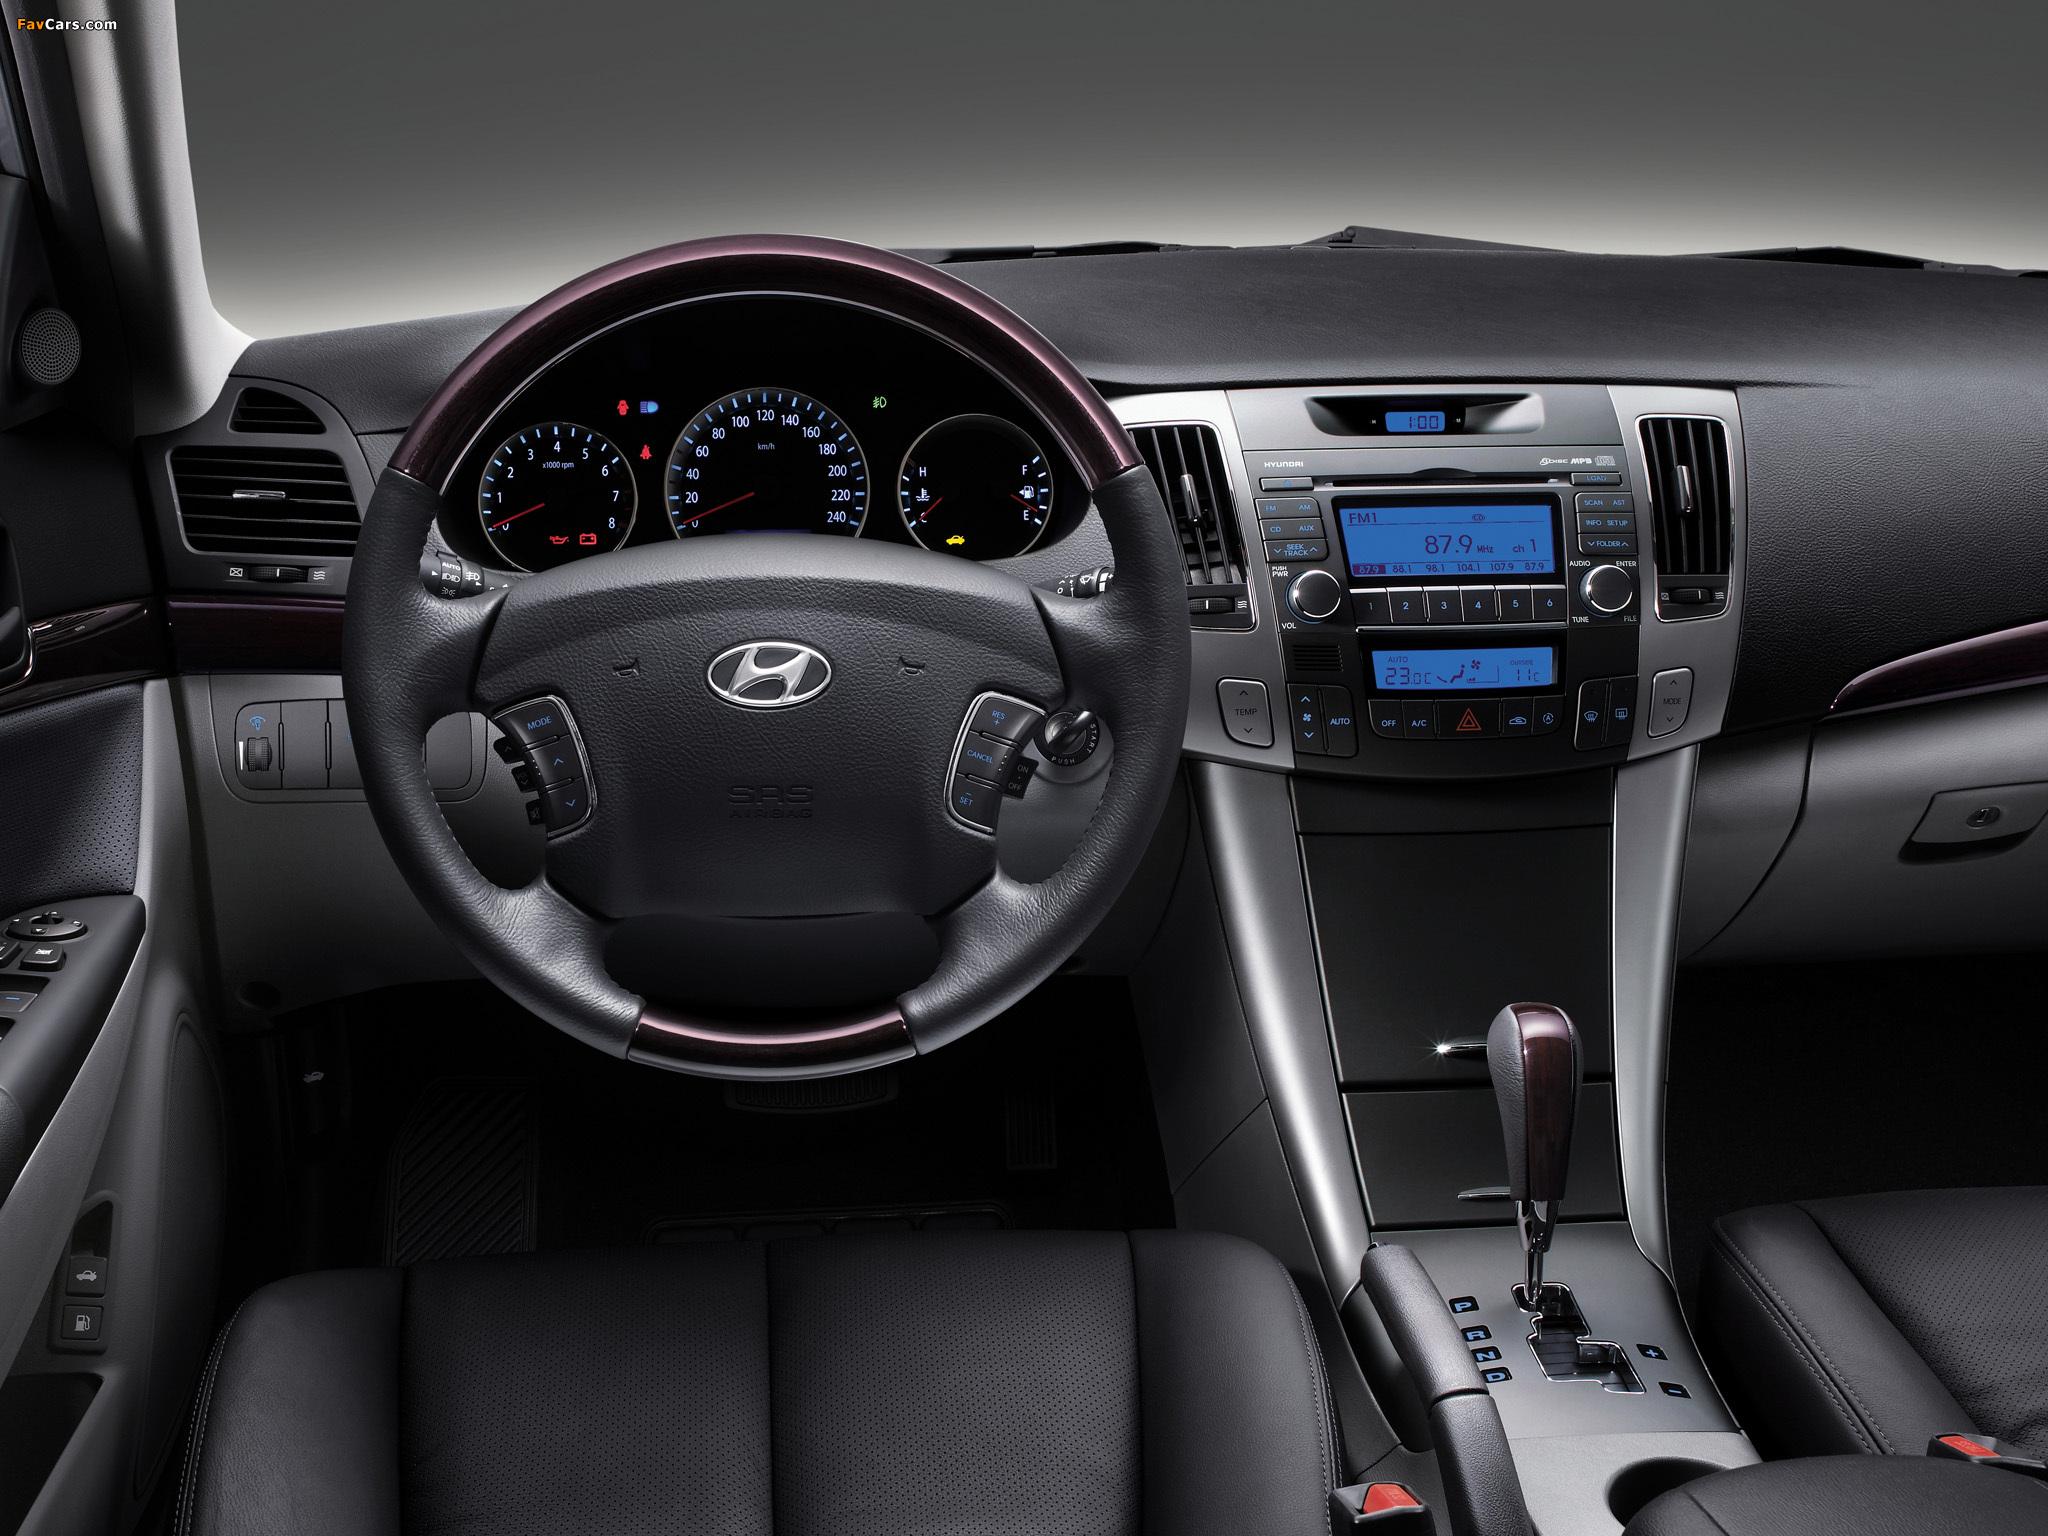 Налет на хромированных накладках кузова Hyundai Sonata NF